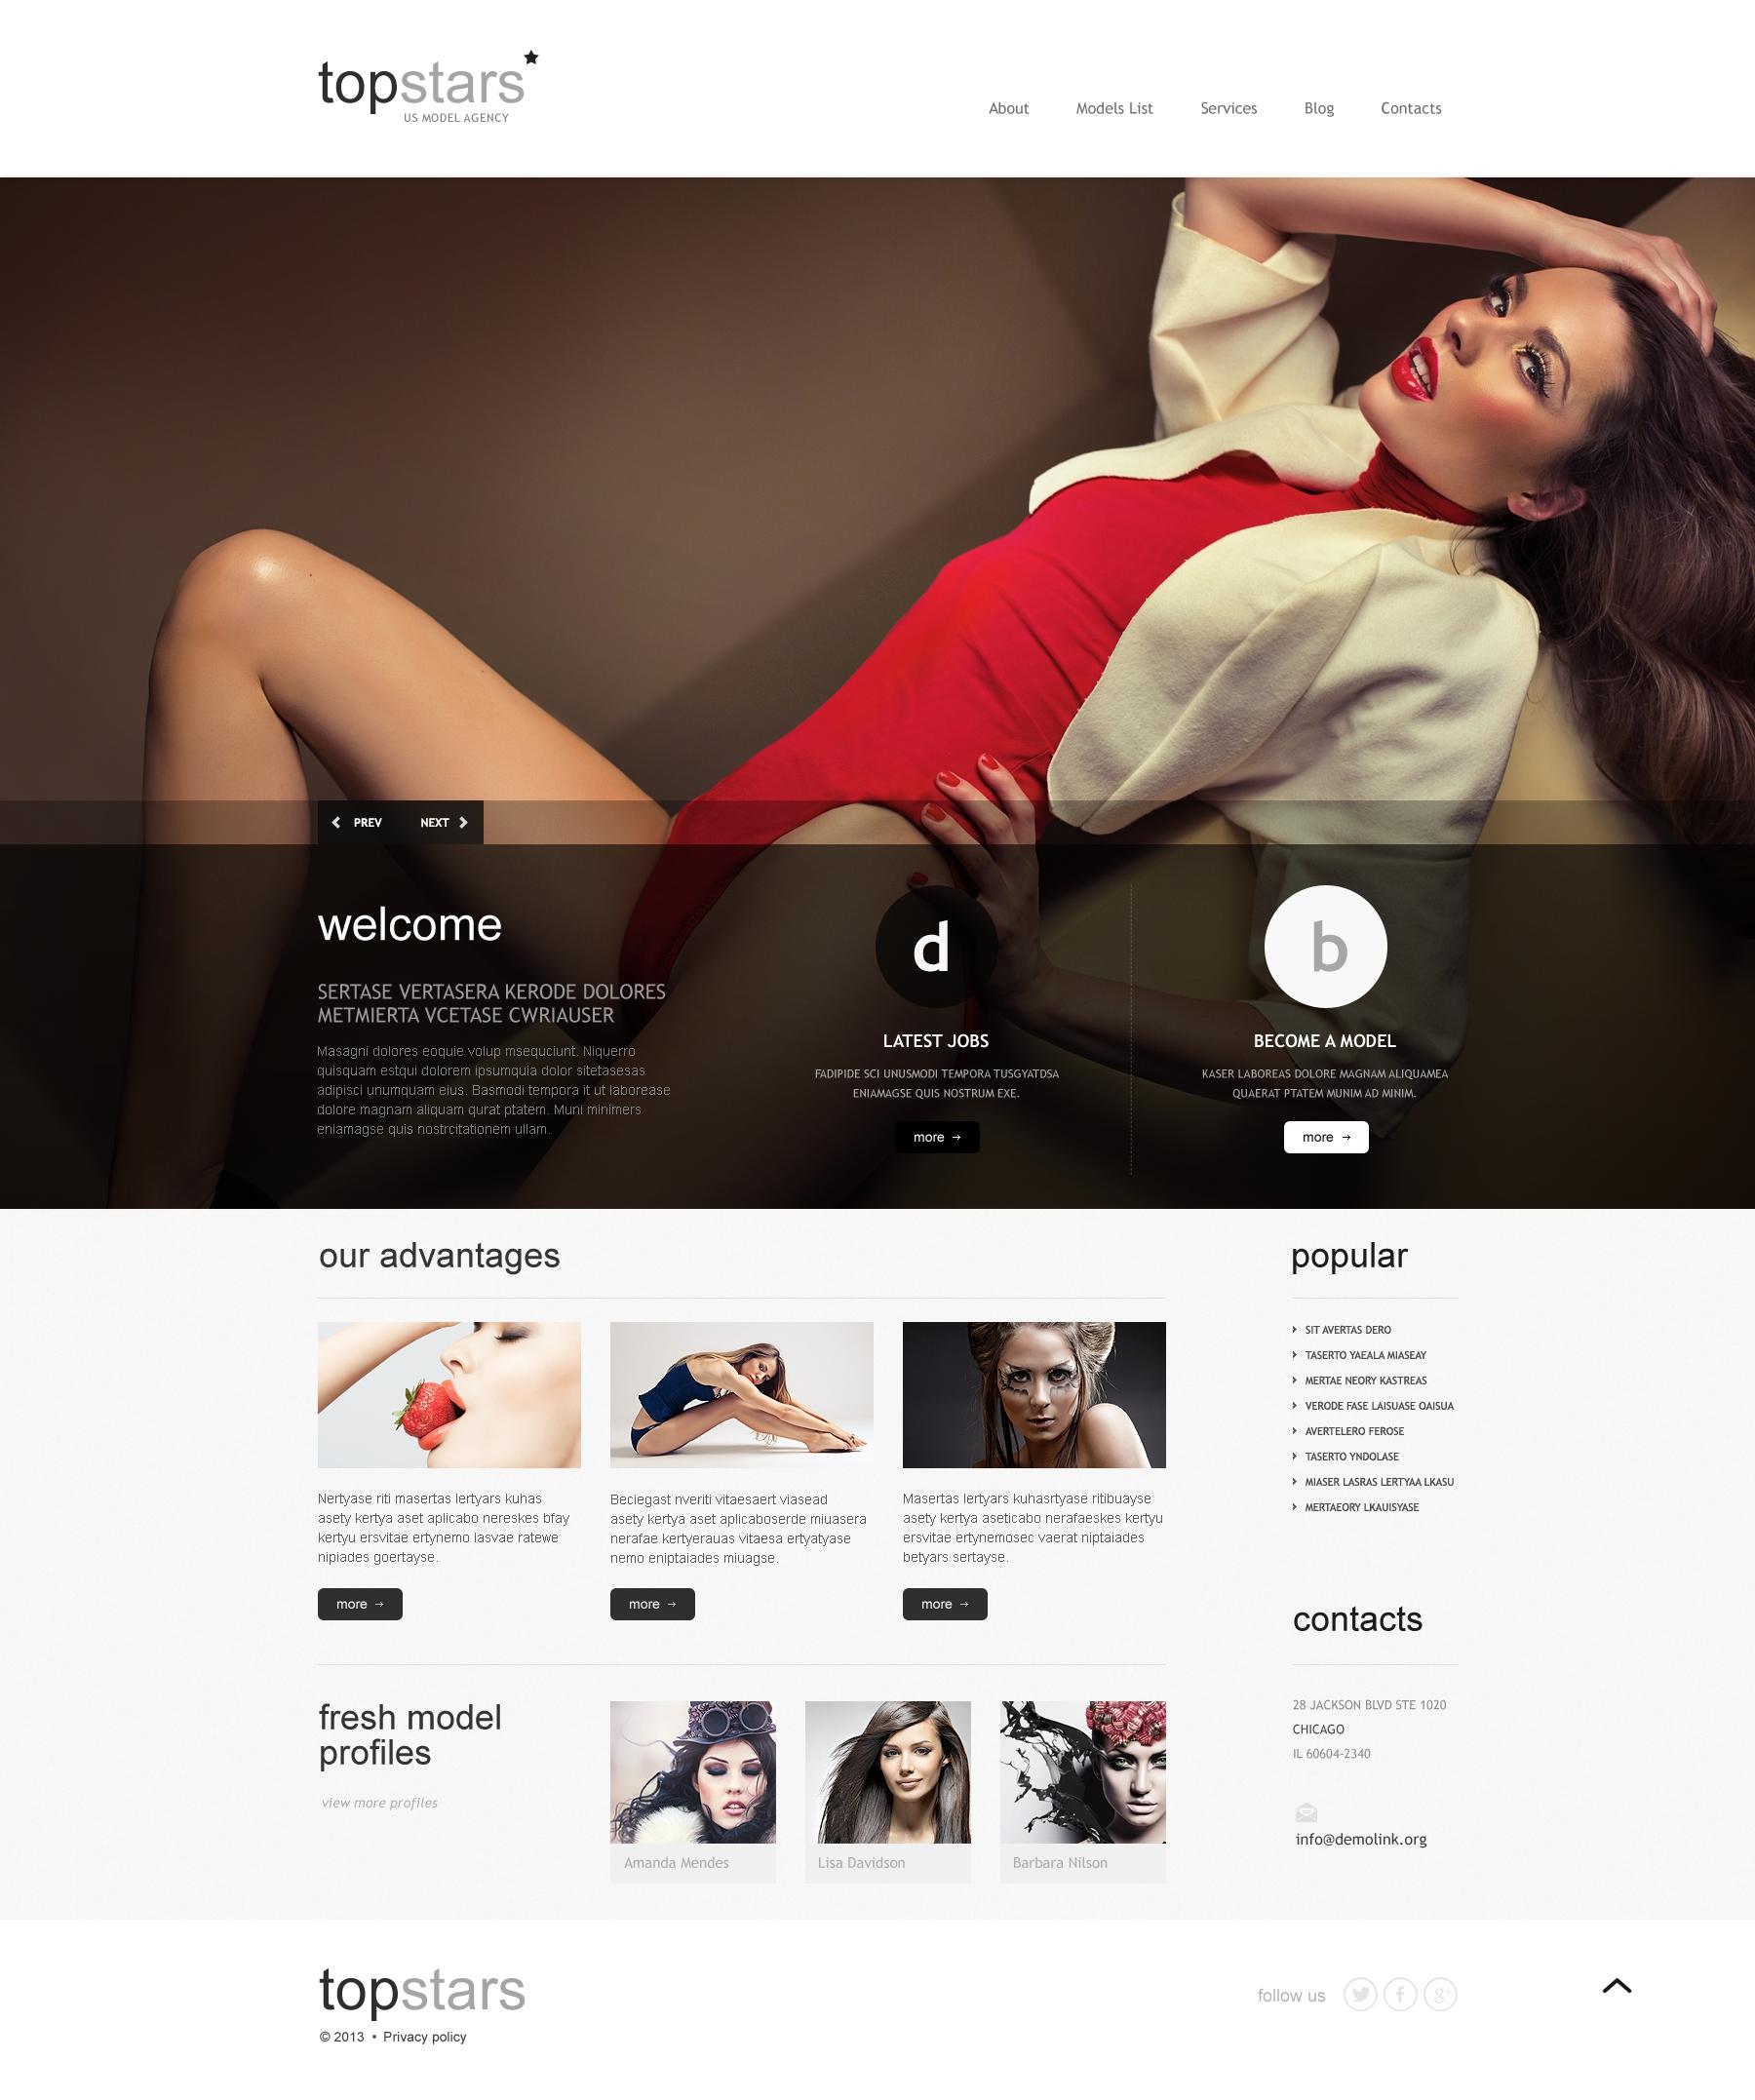 Topstars Model Agency WordPress Theme - screenshot